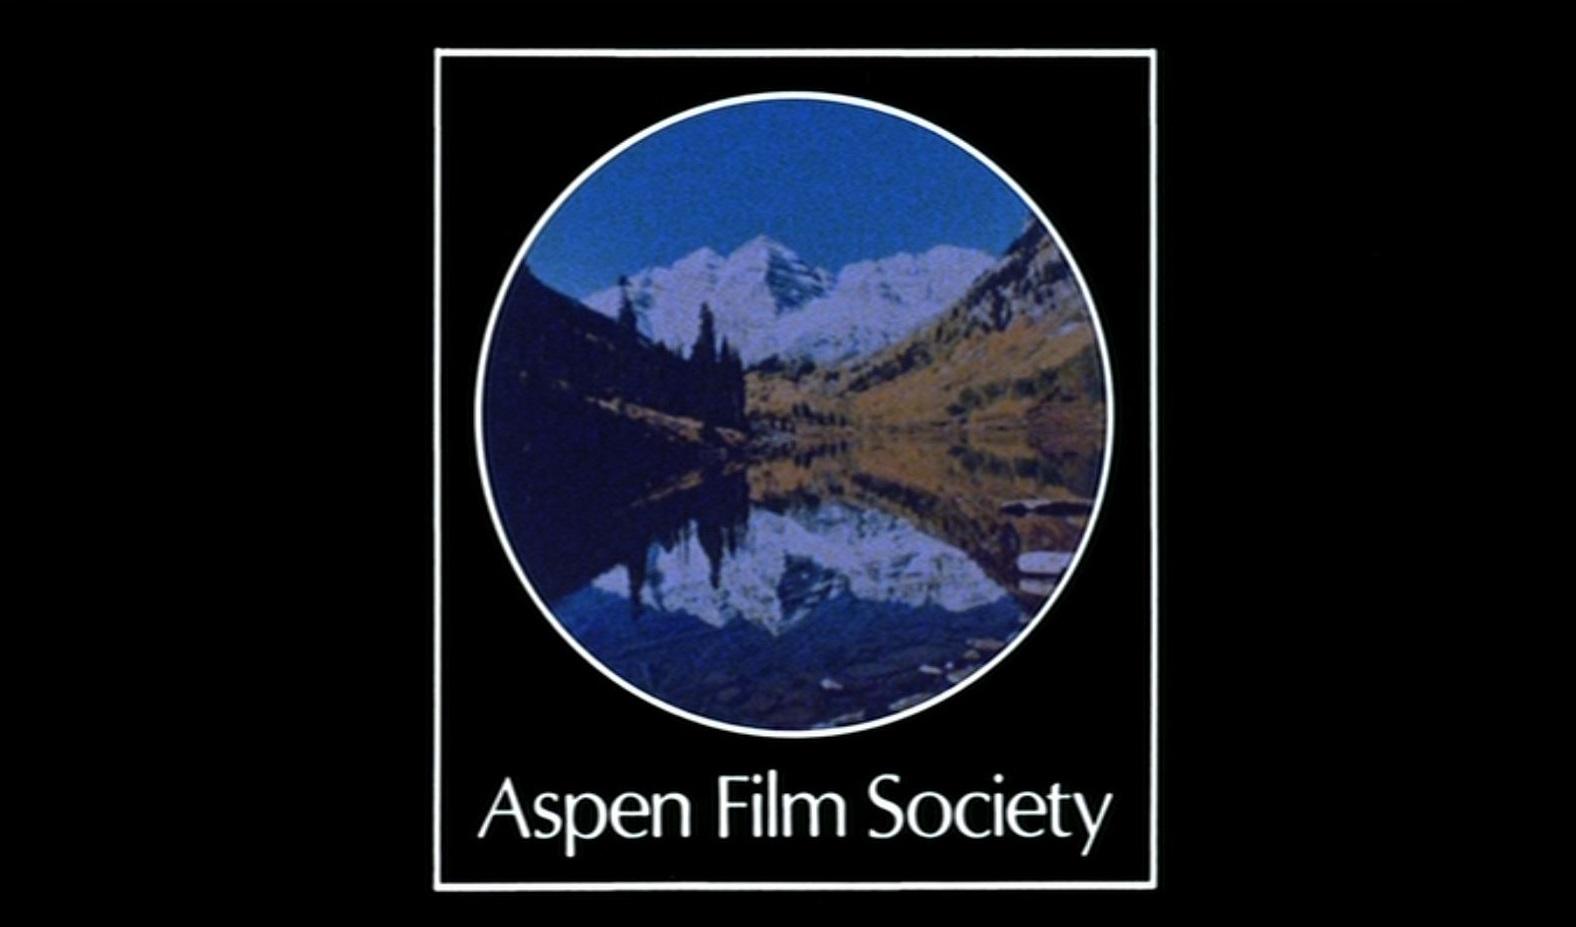 Aspen Film Society